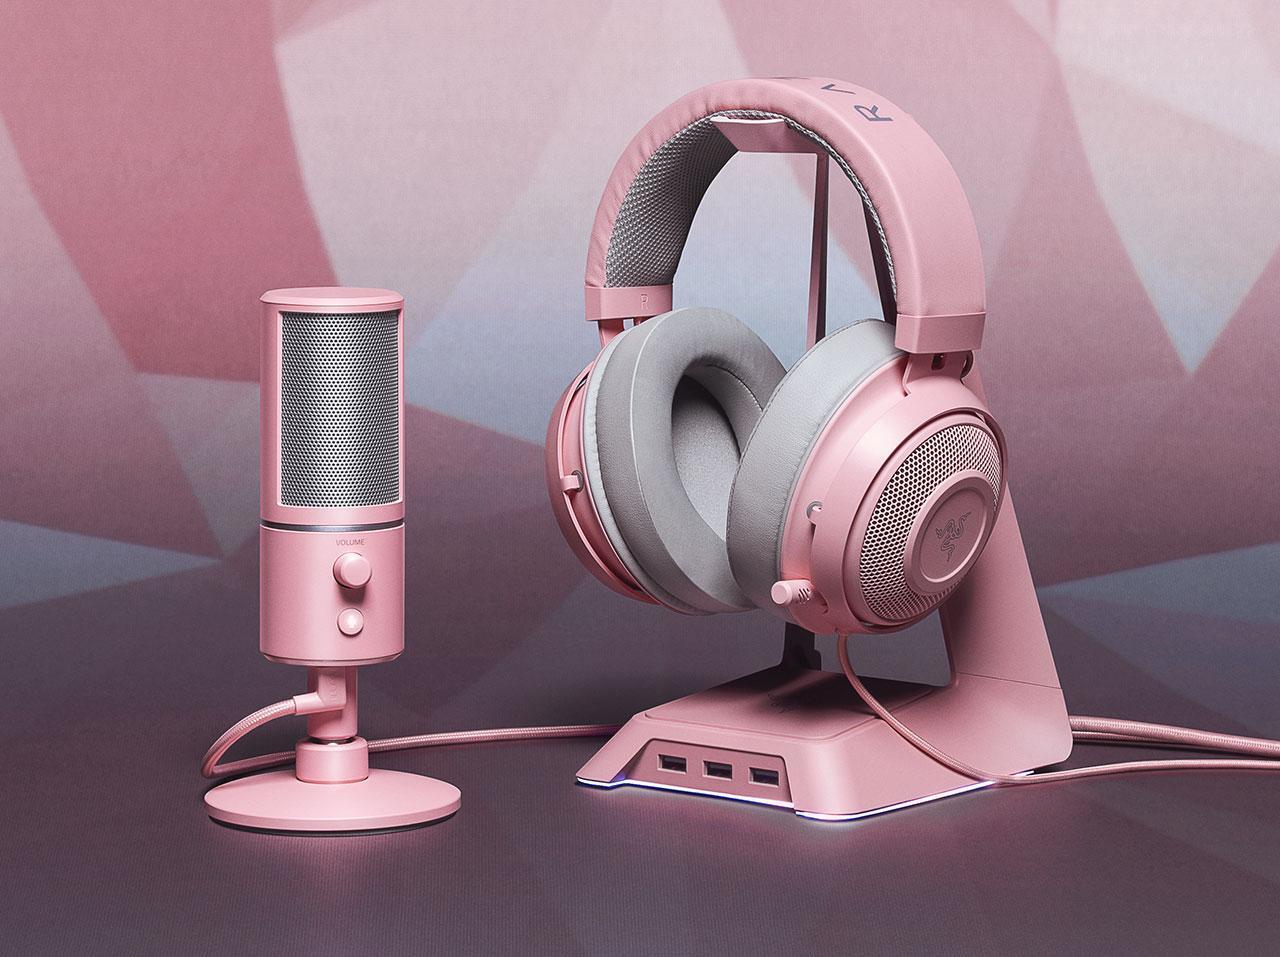 Razer Quartz Pink gaming accessories, laptop detailed